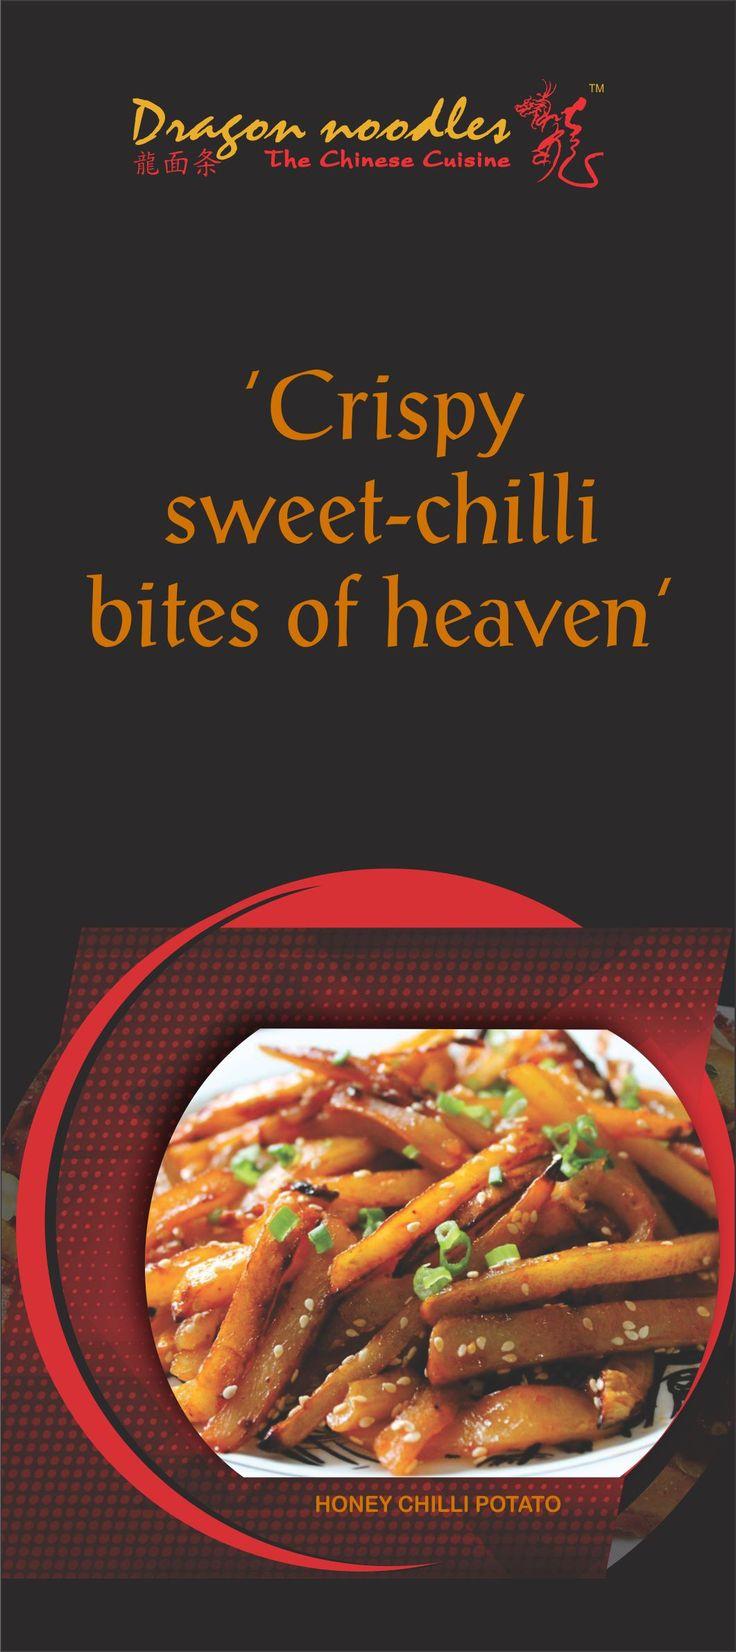 Thinking about Honey Chilli Potatoes? So are we! #DragonNoodles #Chinese #Food #foodies #vaishali #indirapuram #HoneyChilliPotatoes